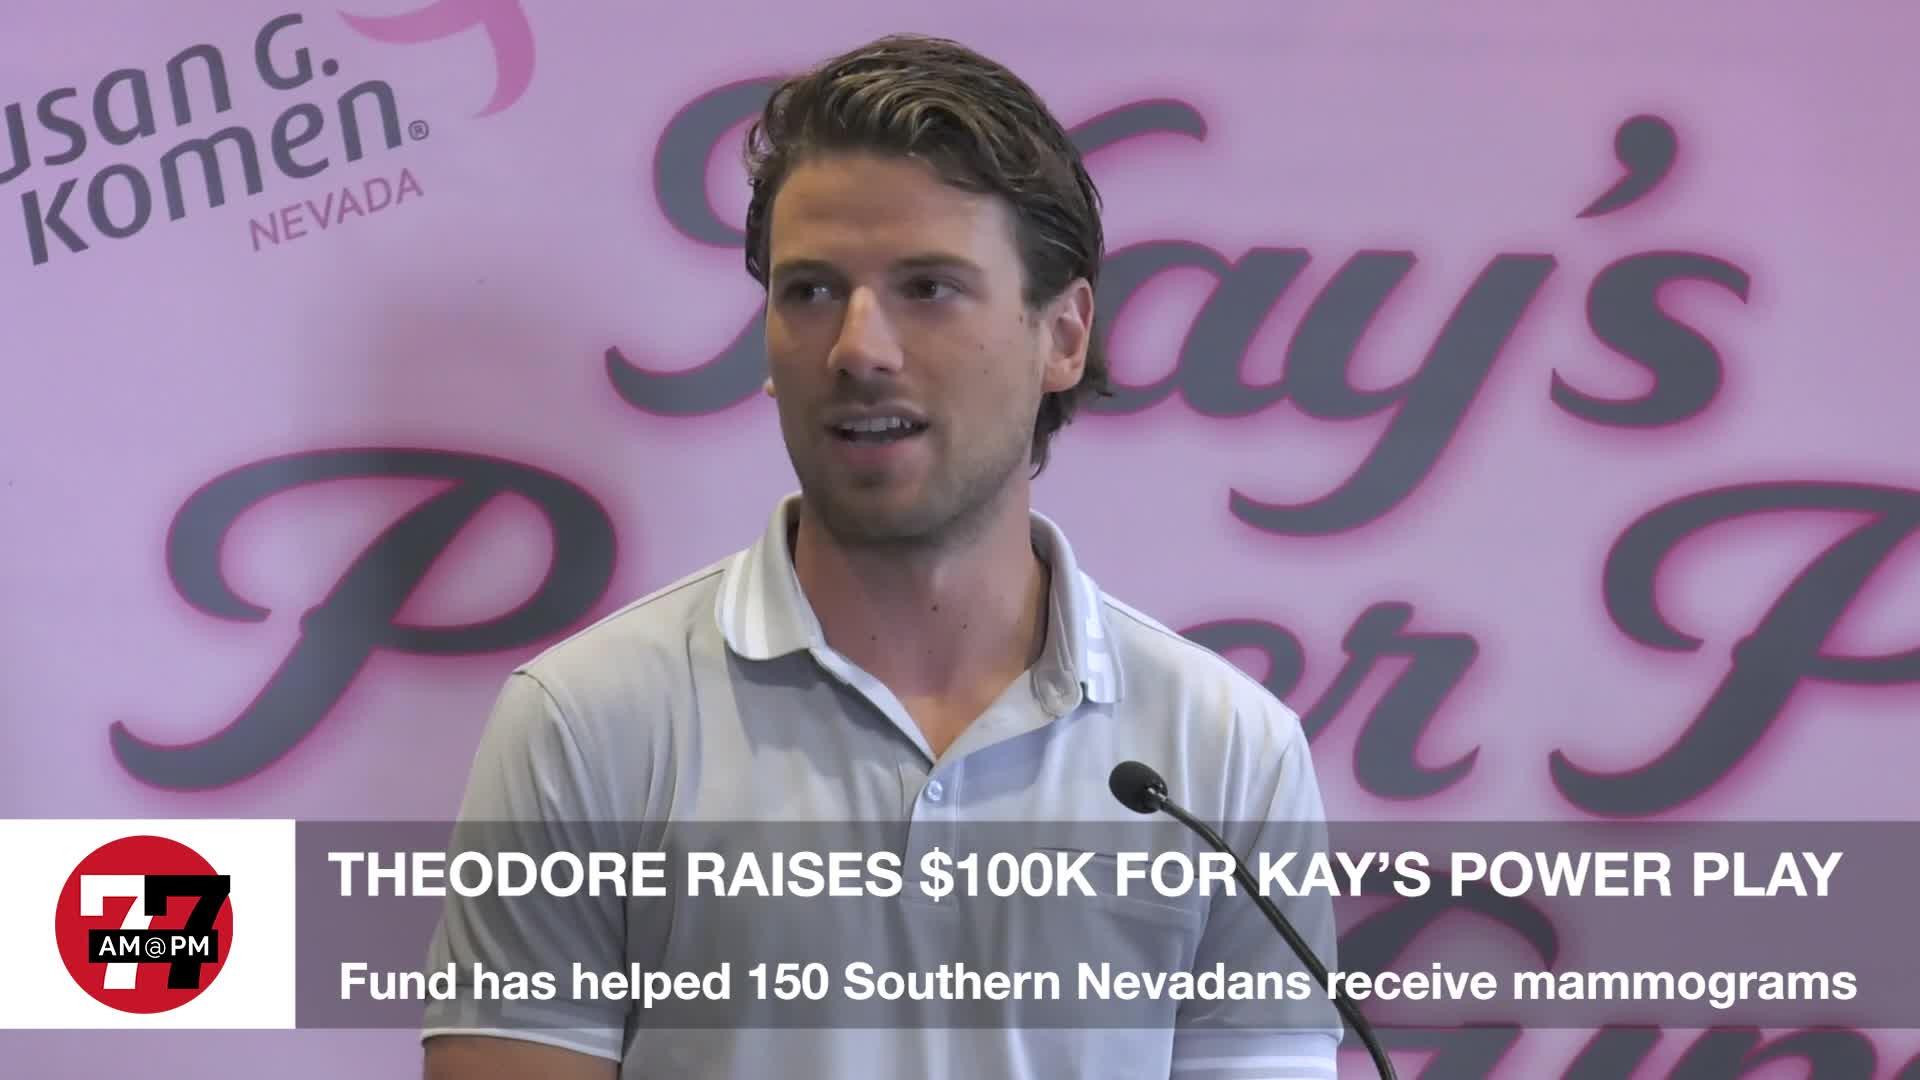 7@7PM Shea Theodore Raises $100K for Kay's Power Play